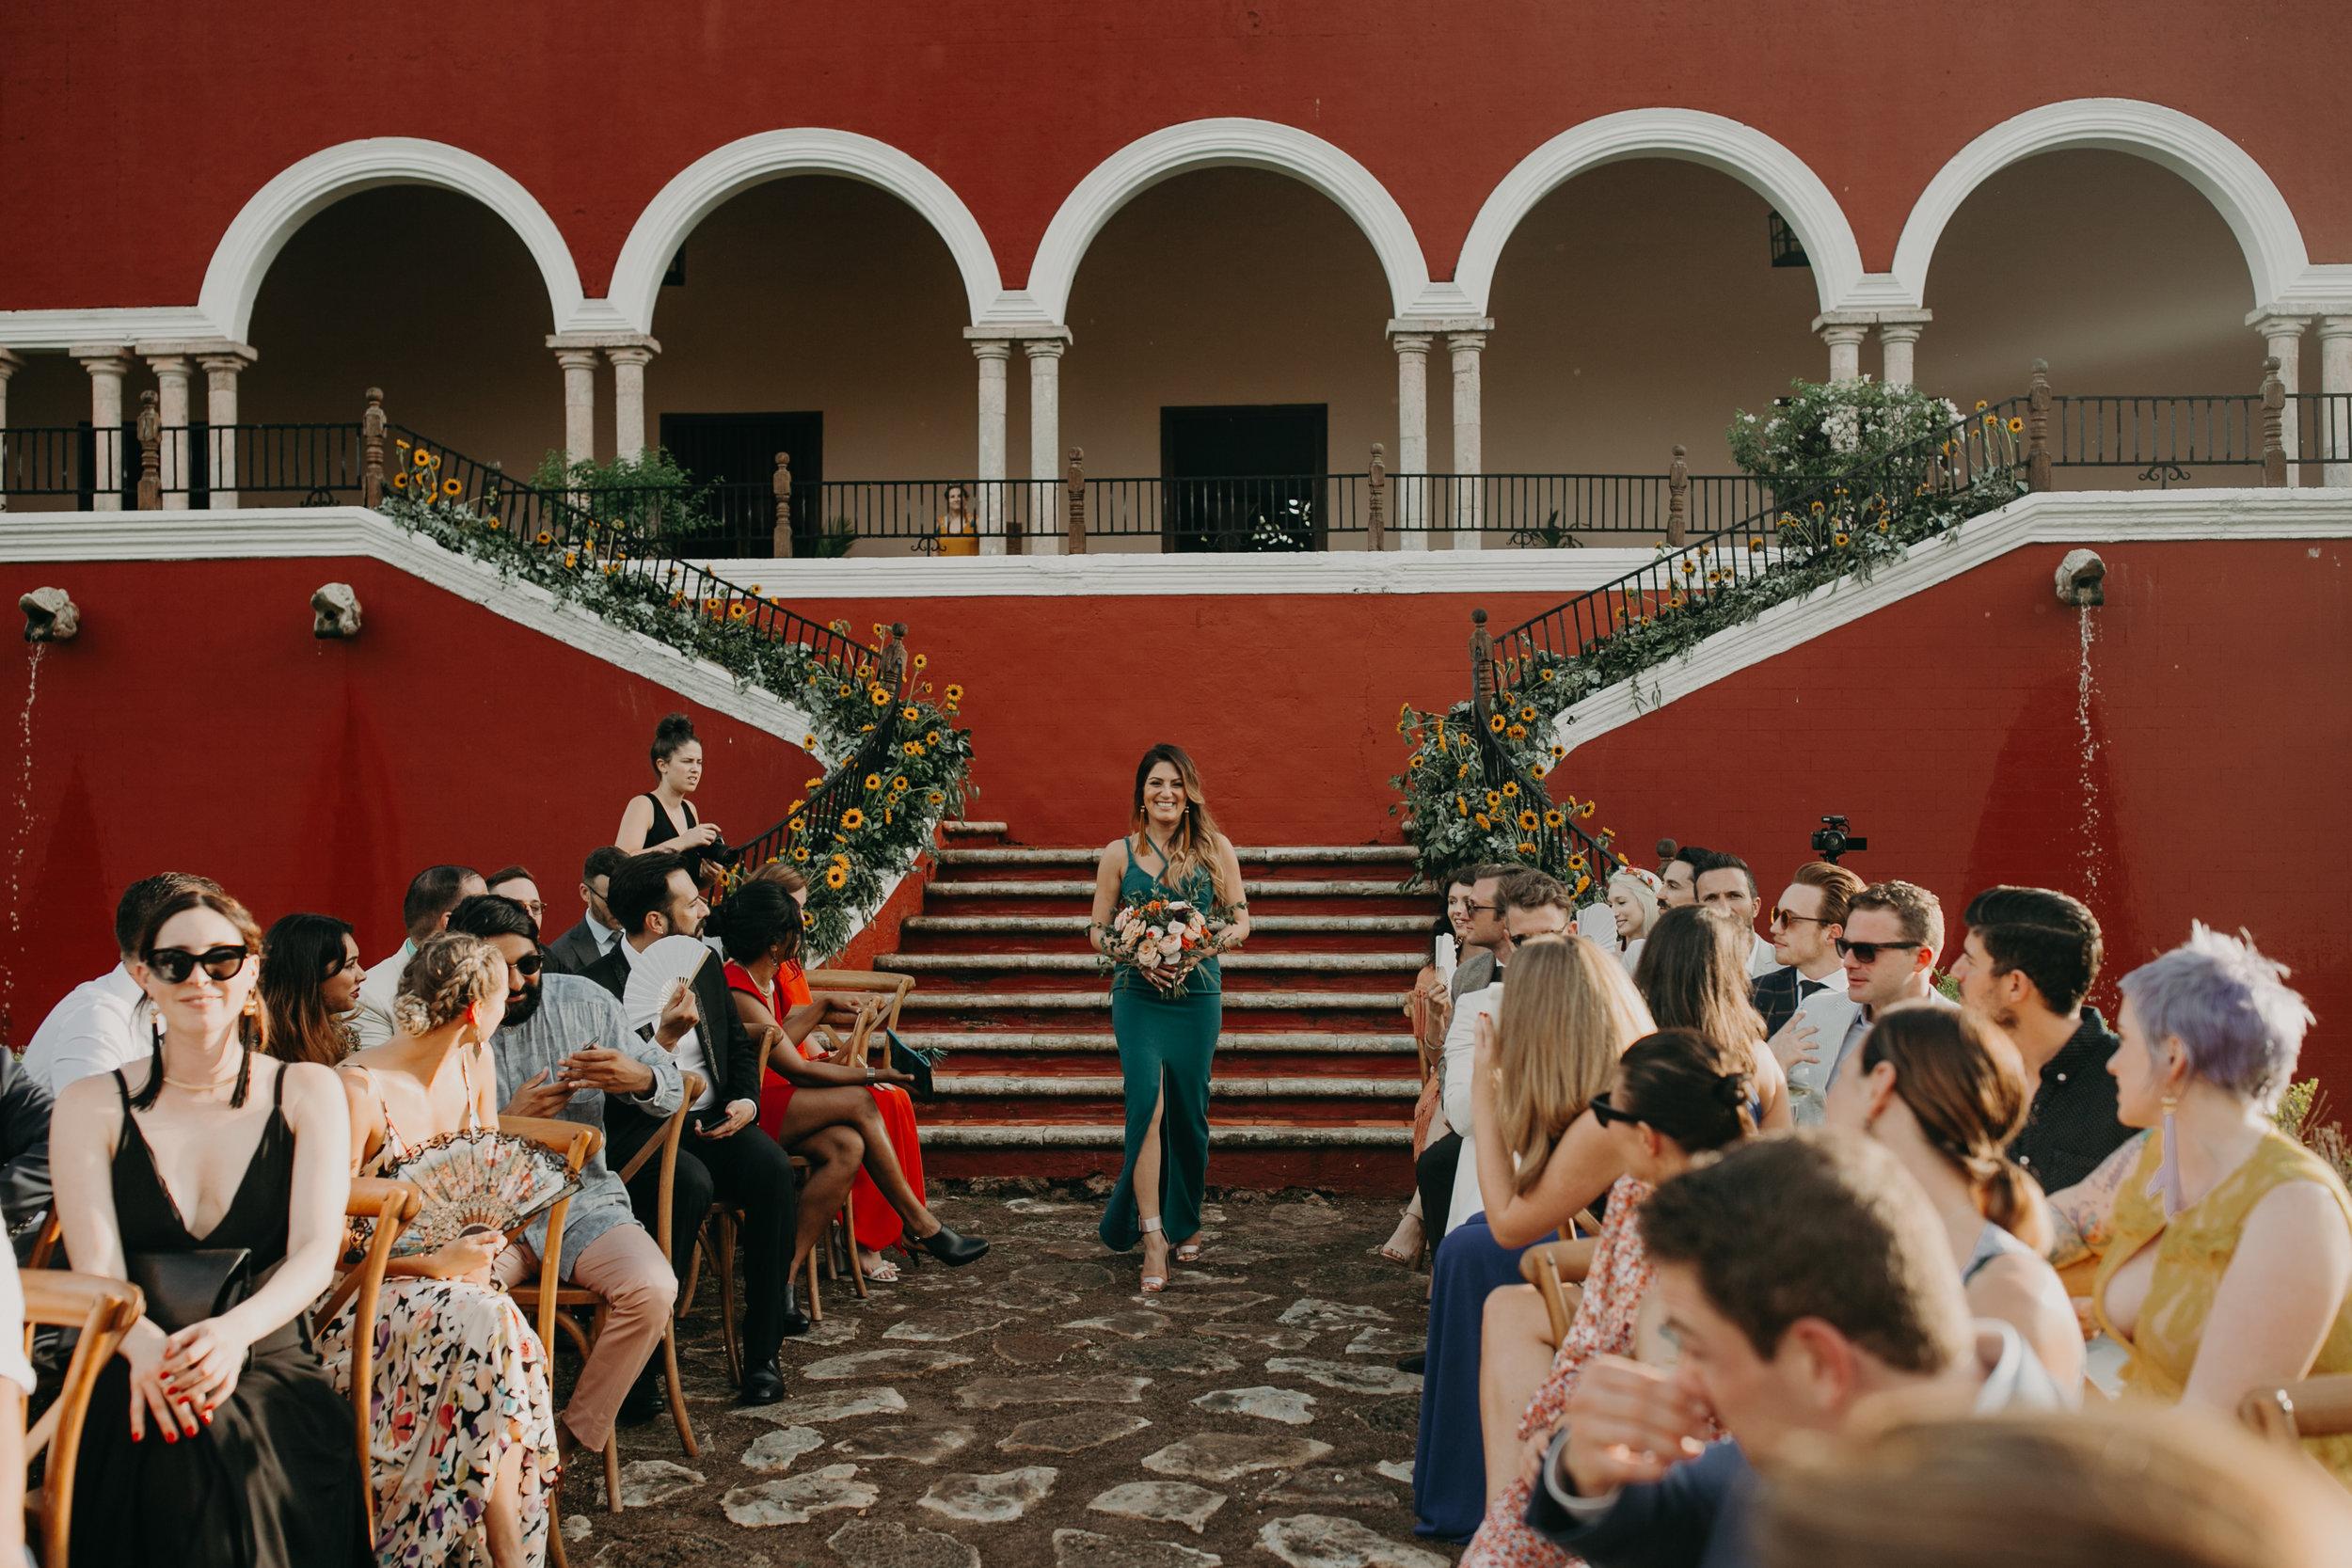 Hacienda Temozon Yucatan Mexico Wedding | Ida & Peter Emily Magers Photography-955.jpg